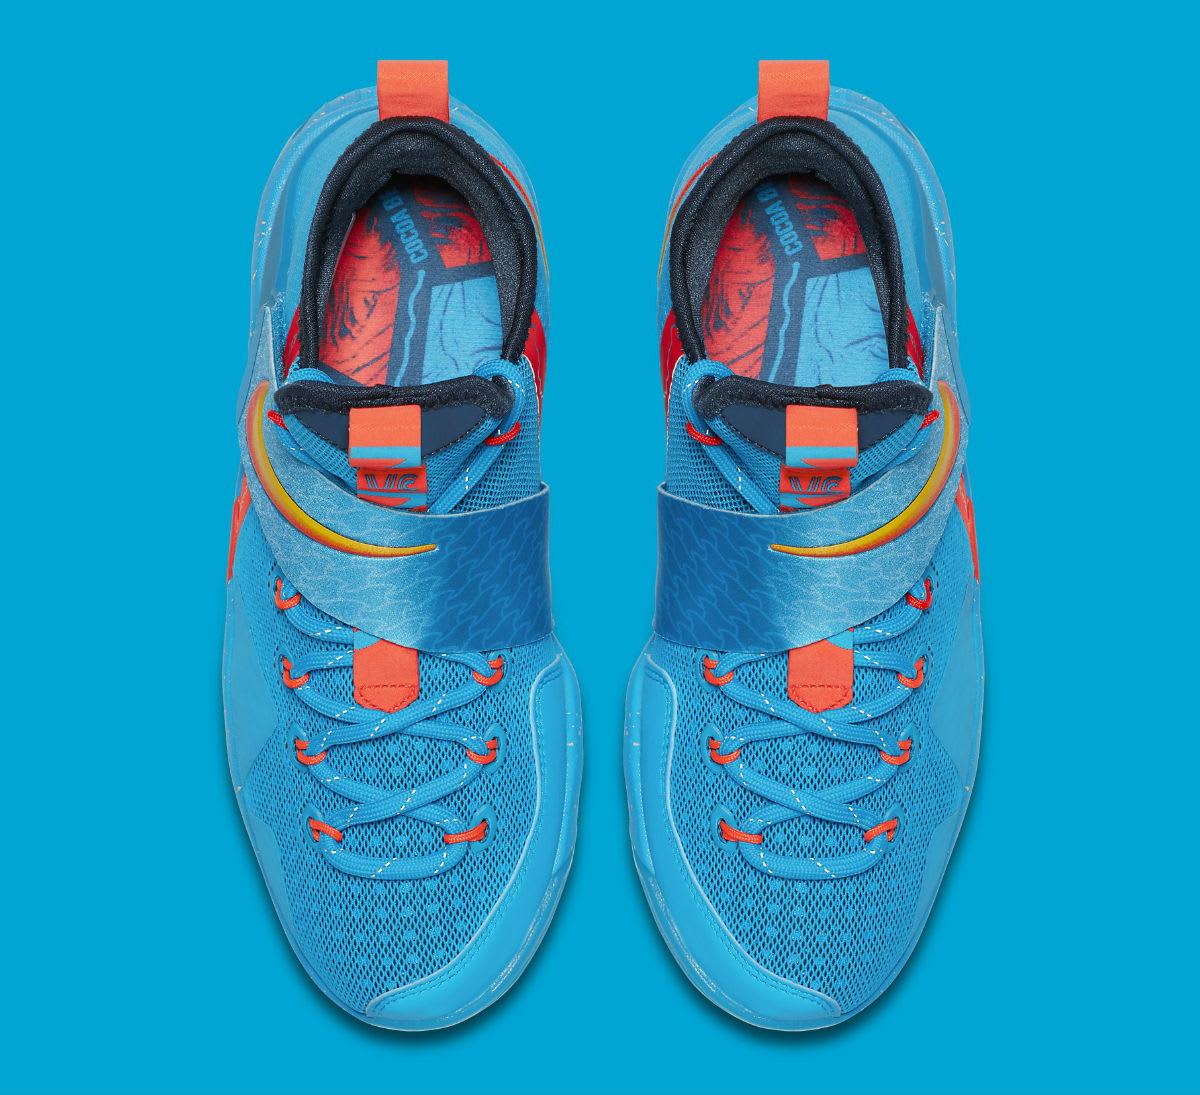 Nike LeBron 14 GS Cocoa Beach Release Date Top 859468-477